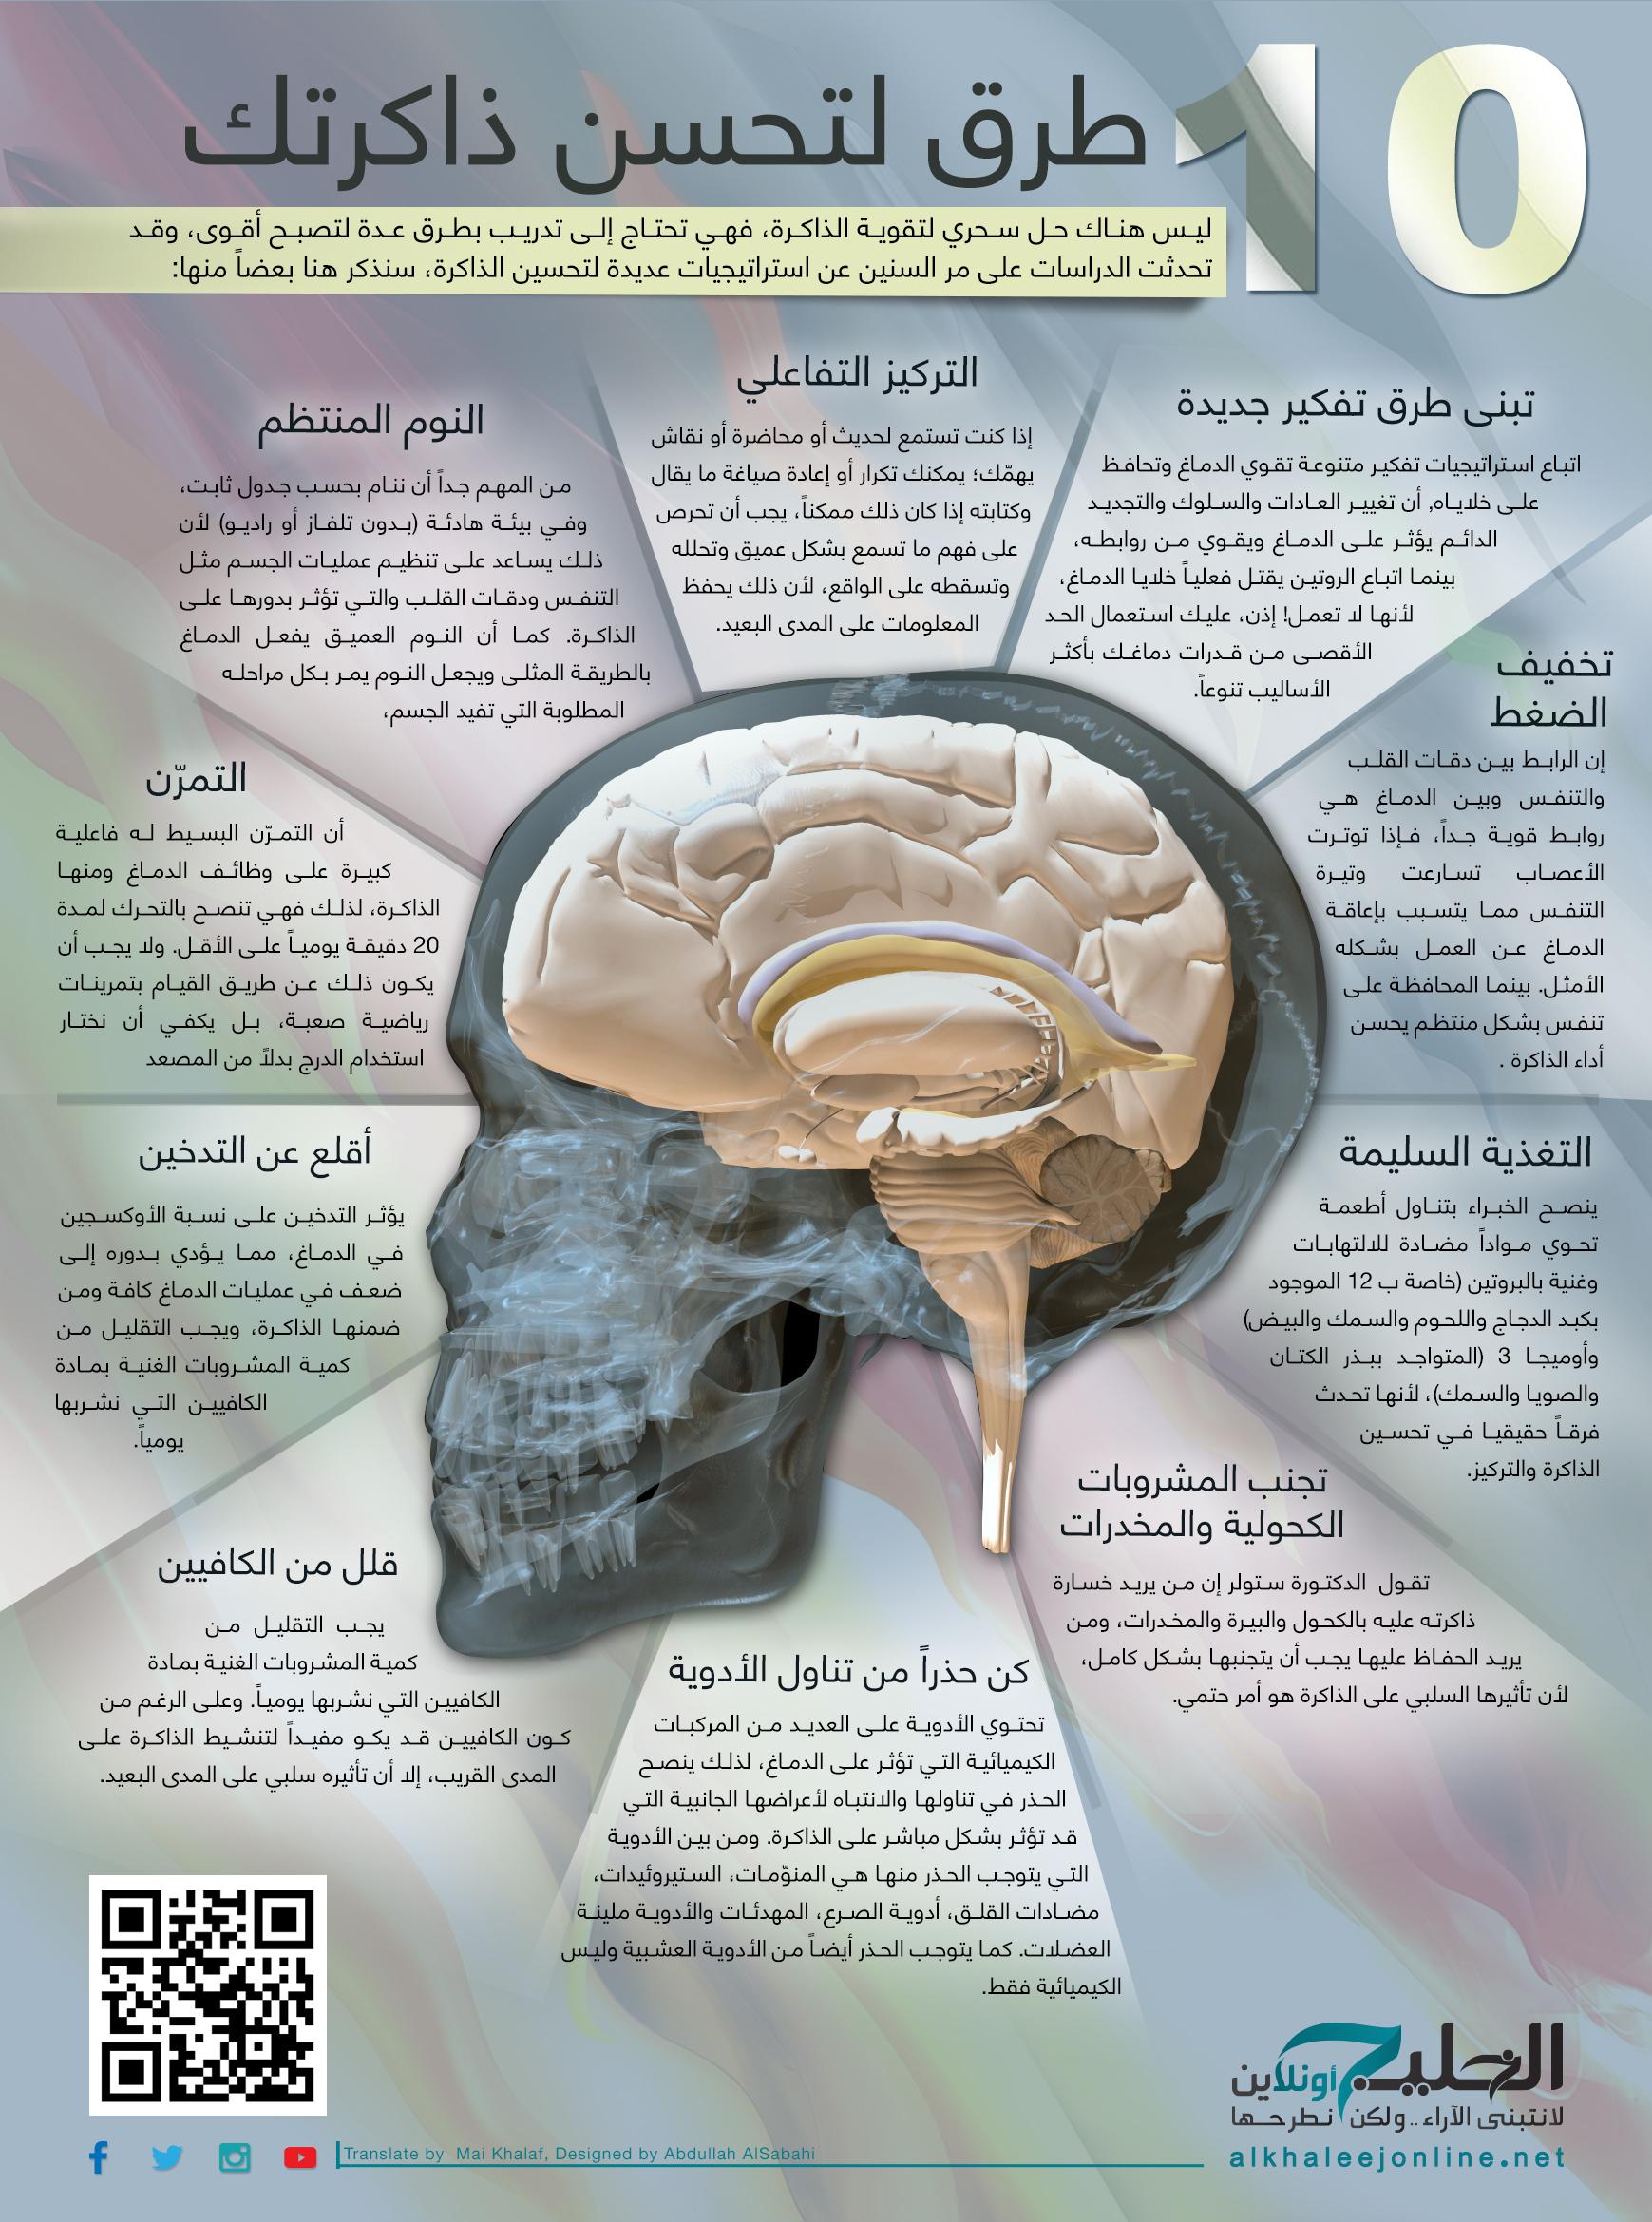 Enhance mind